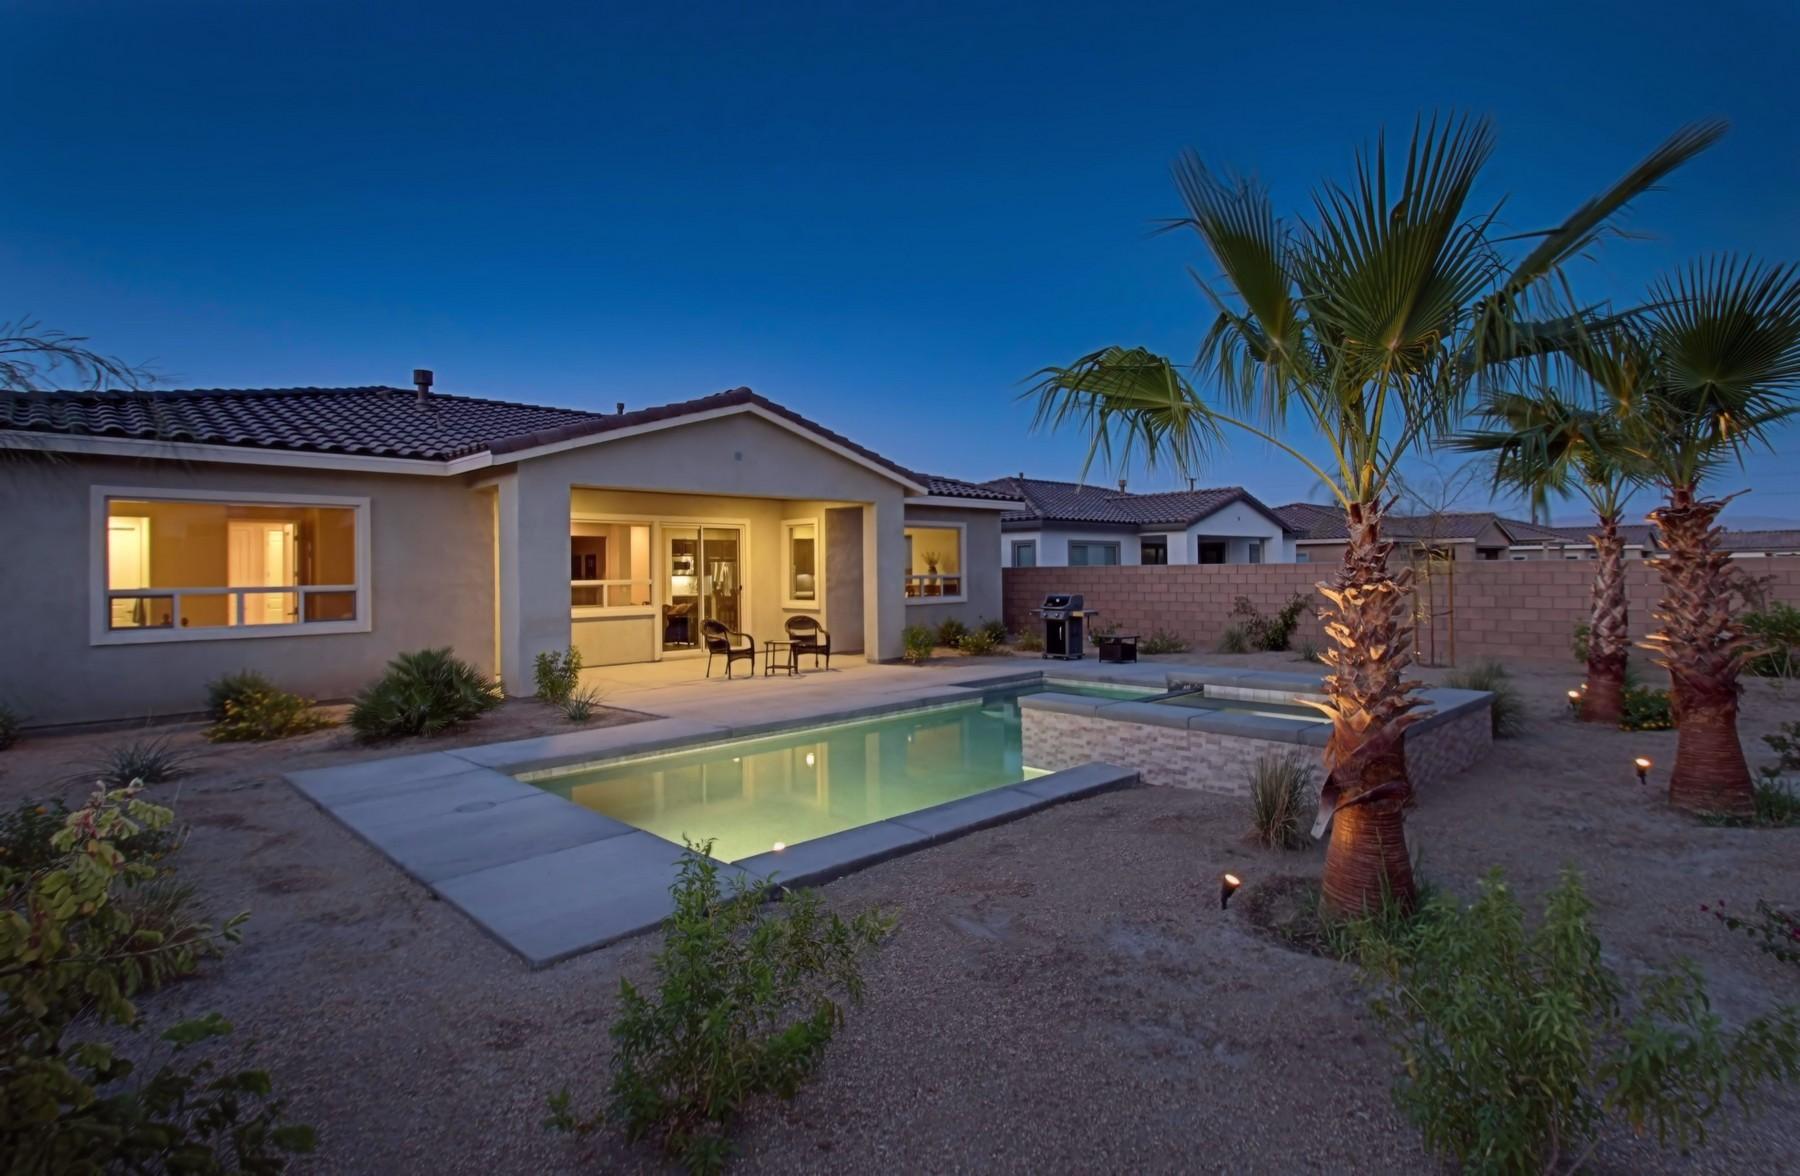 Single Family Home for Sale at 74107 Encore Lane Palm Desert, California 92211 United States